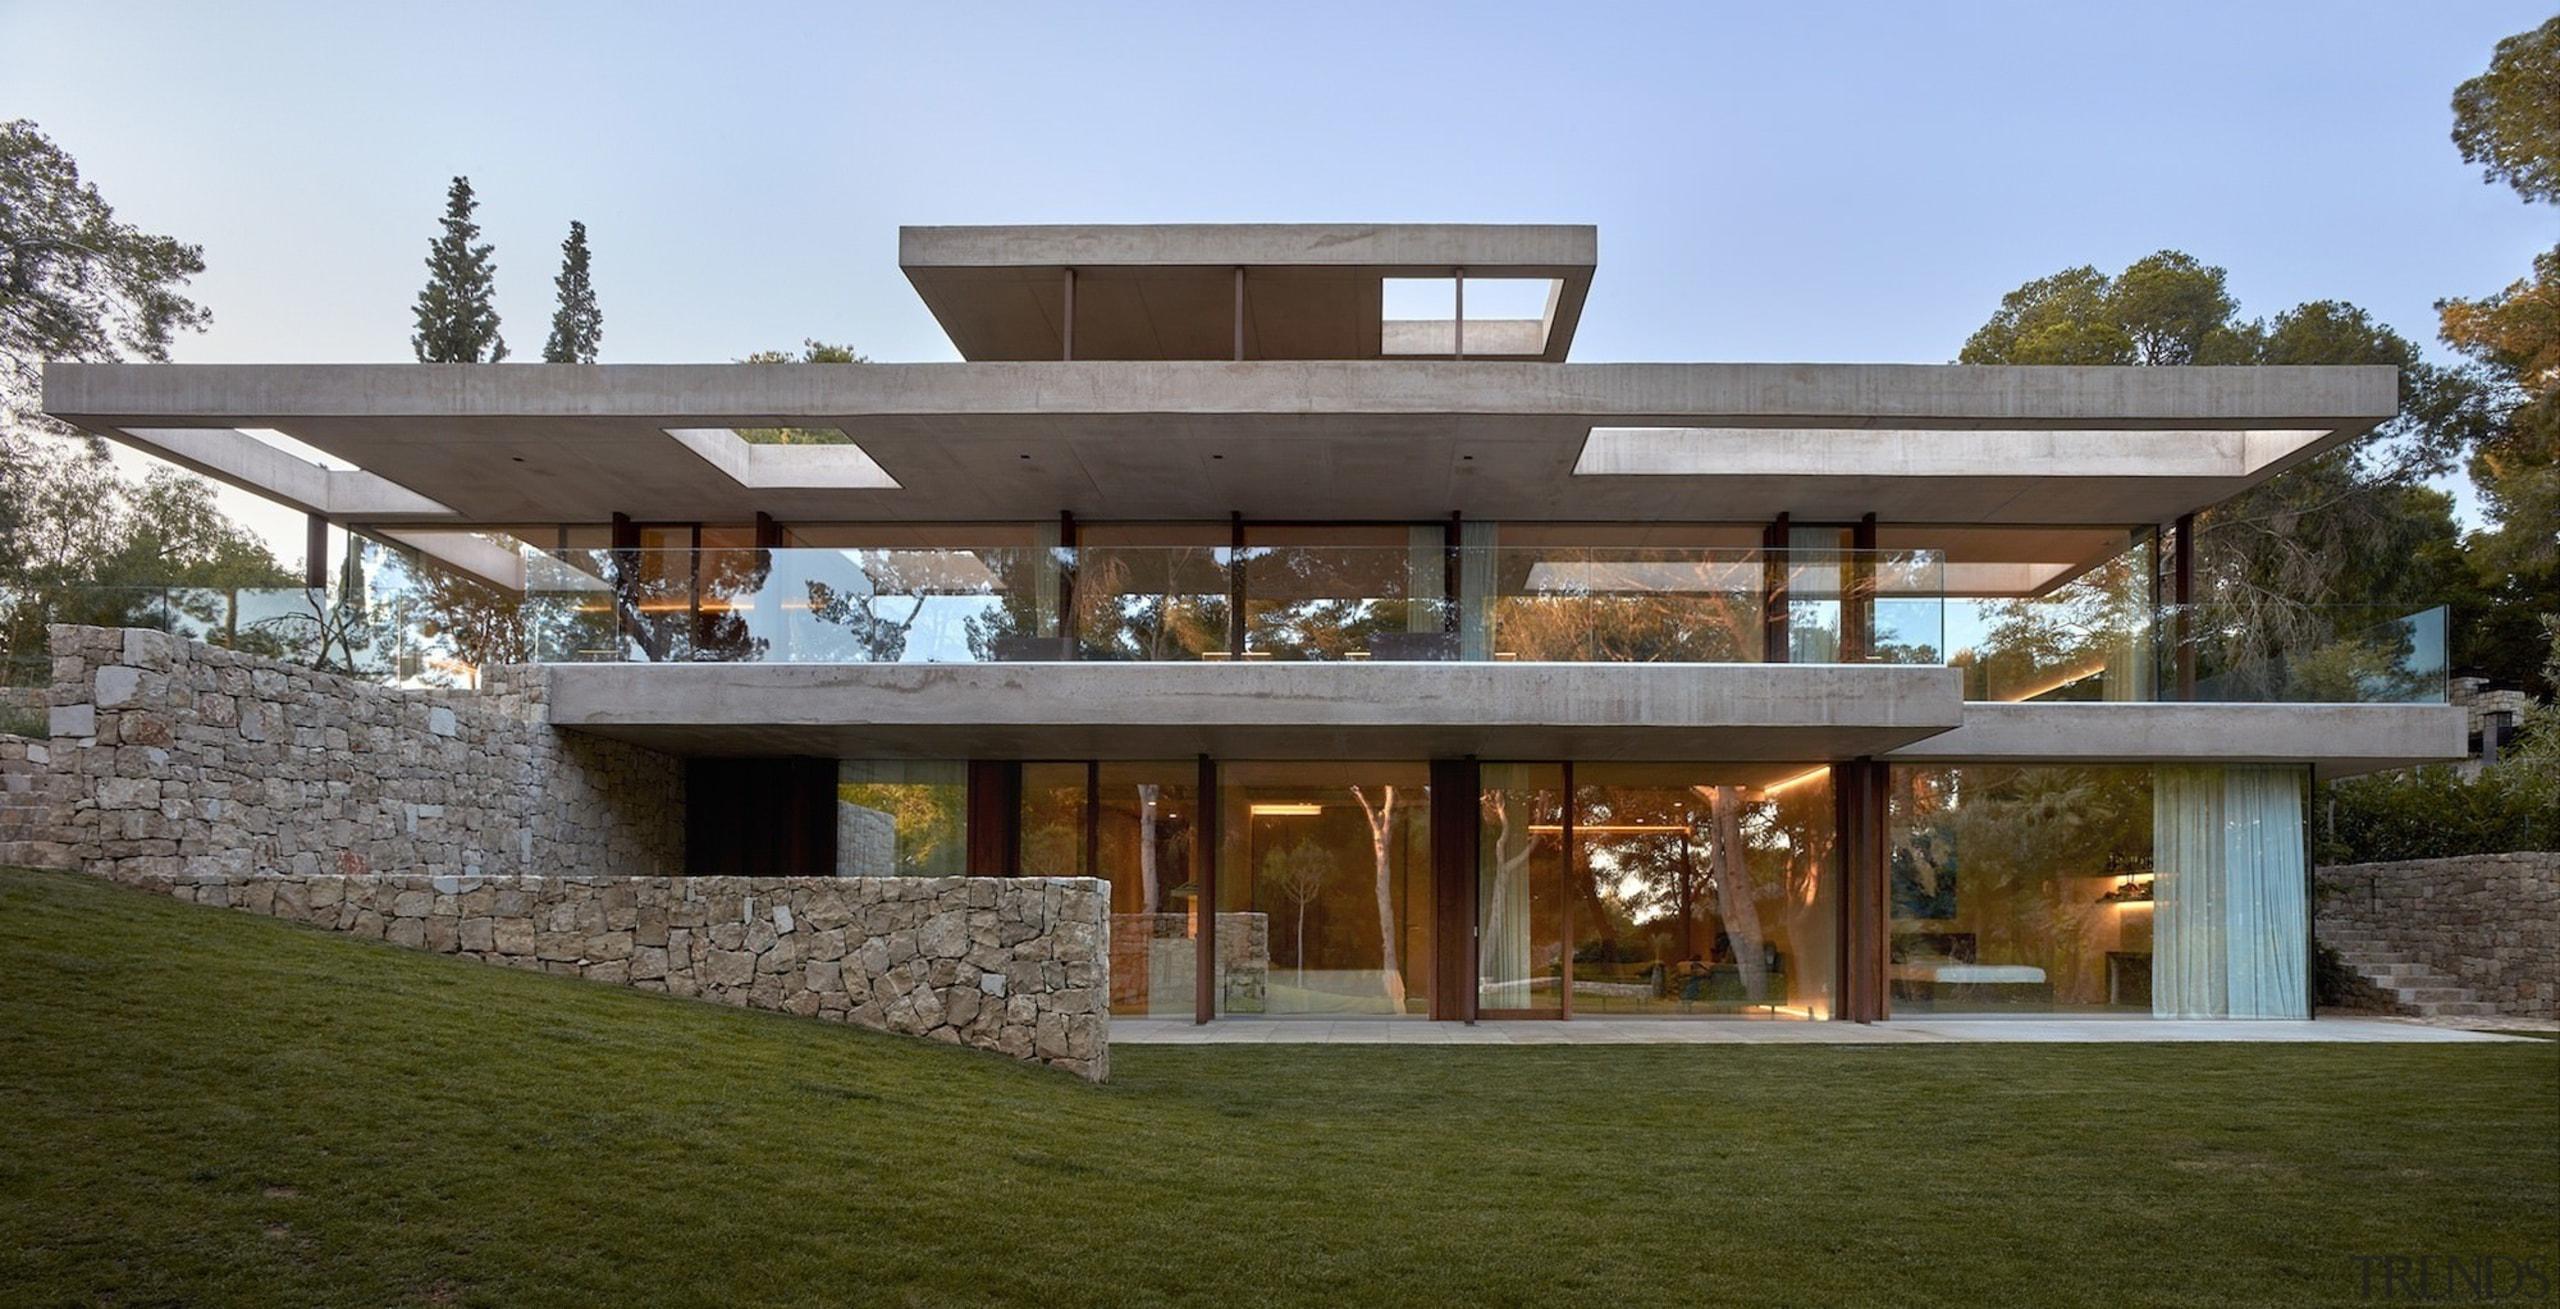 Architect: Ramón Esteve Estudio de Arquitectura architecture, elevation, facade, home, house, property, real estate, residential area, brown